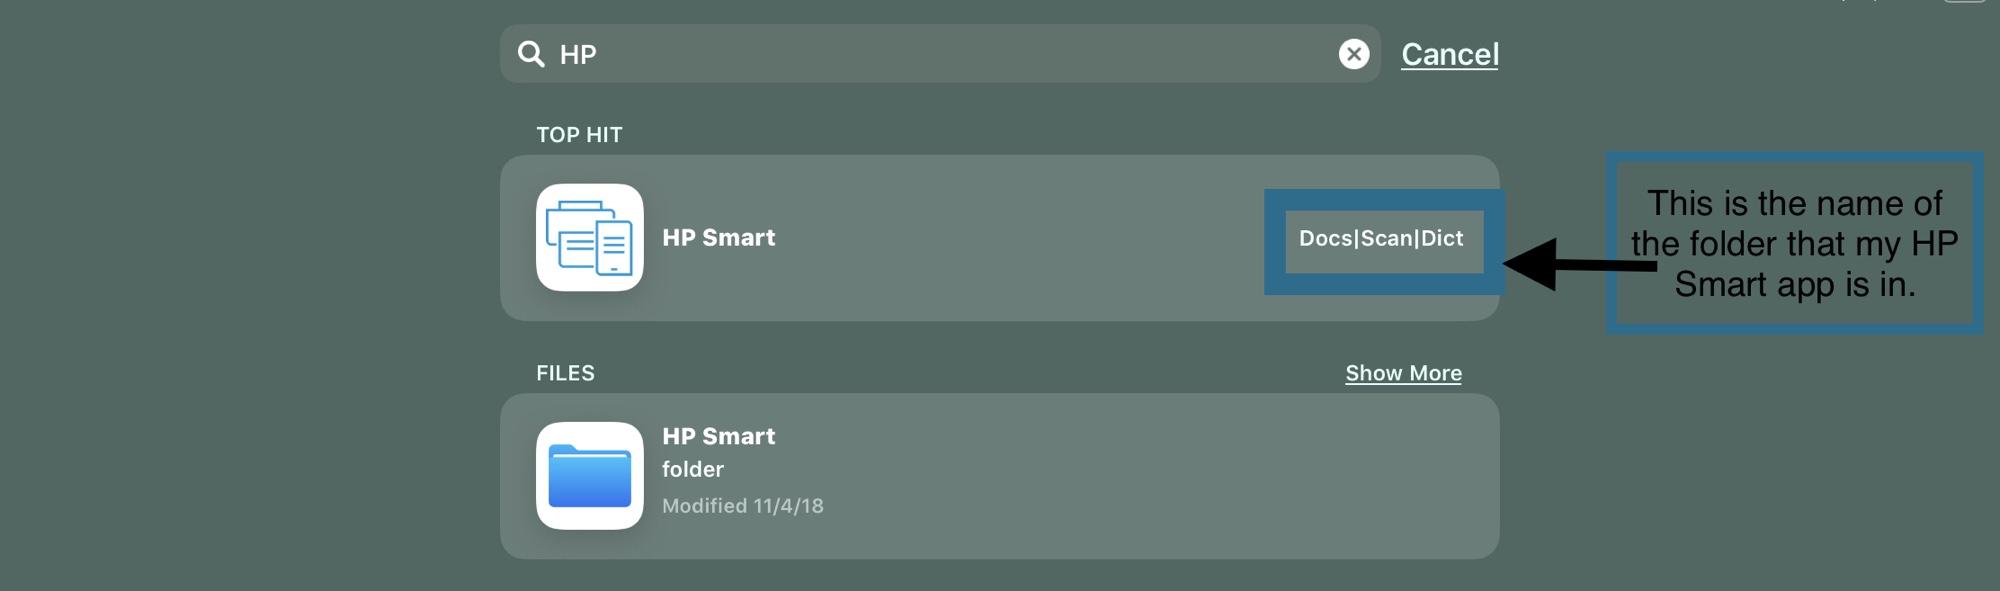 Fix a Missing Print icon in Safari ios 12   HP Printer's Tap to